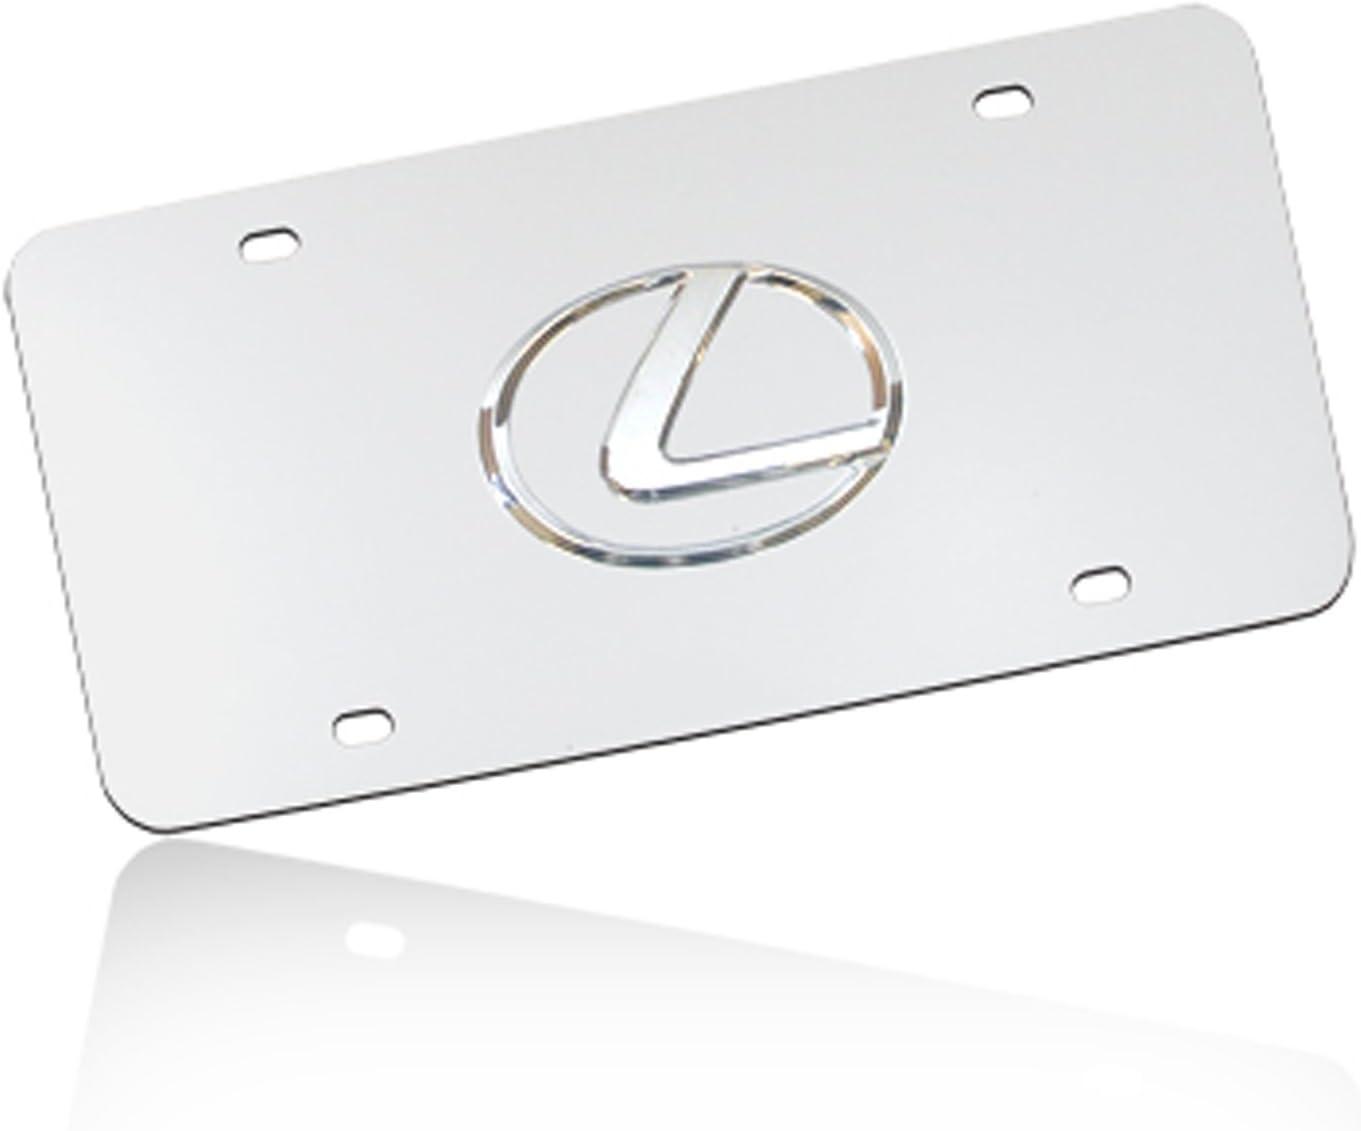 Lexus 3D Logo Chrome Stainless Steel License Plate